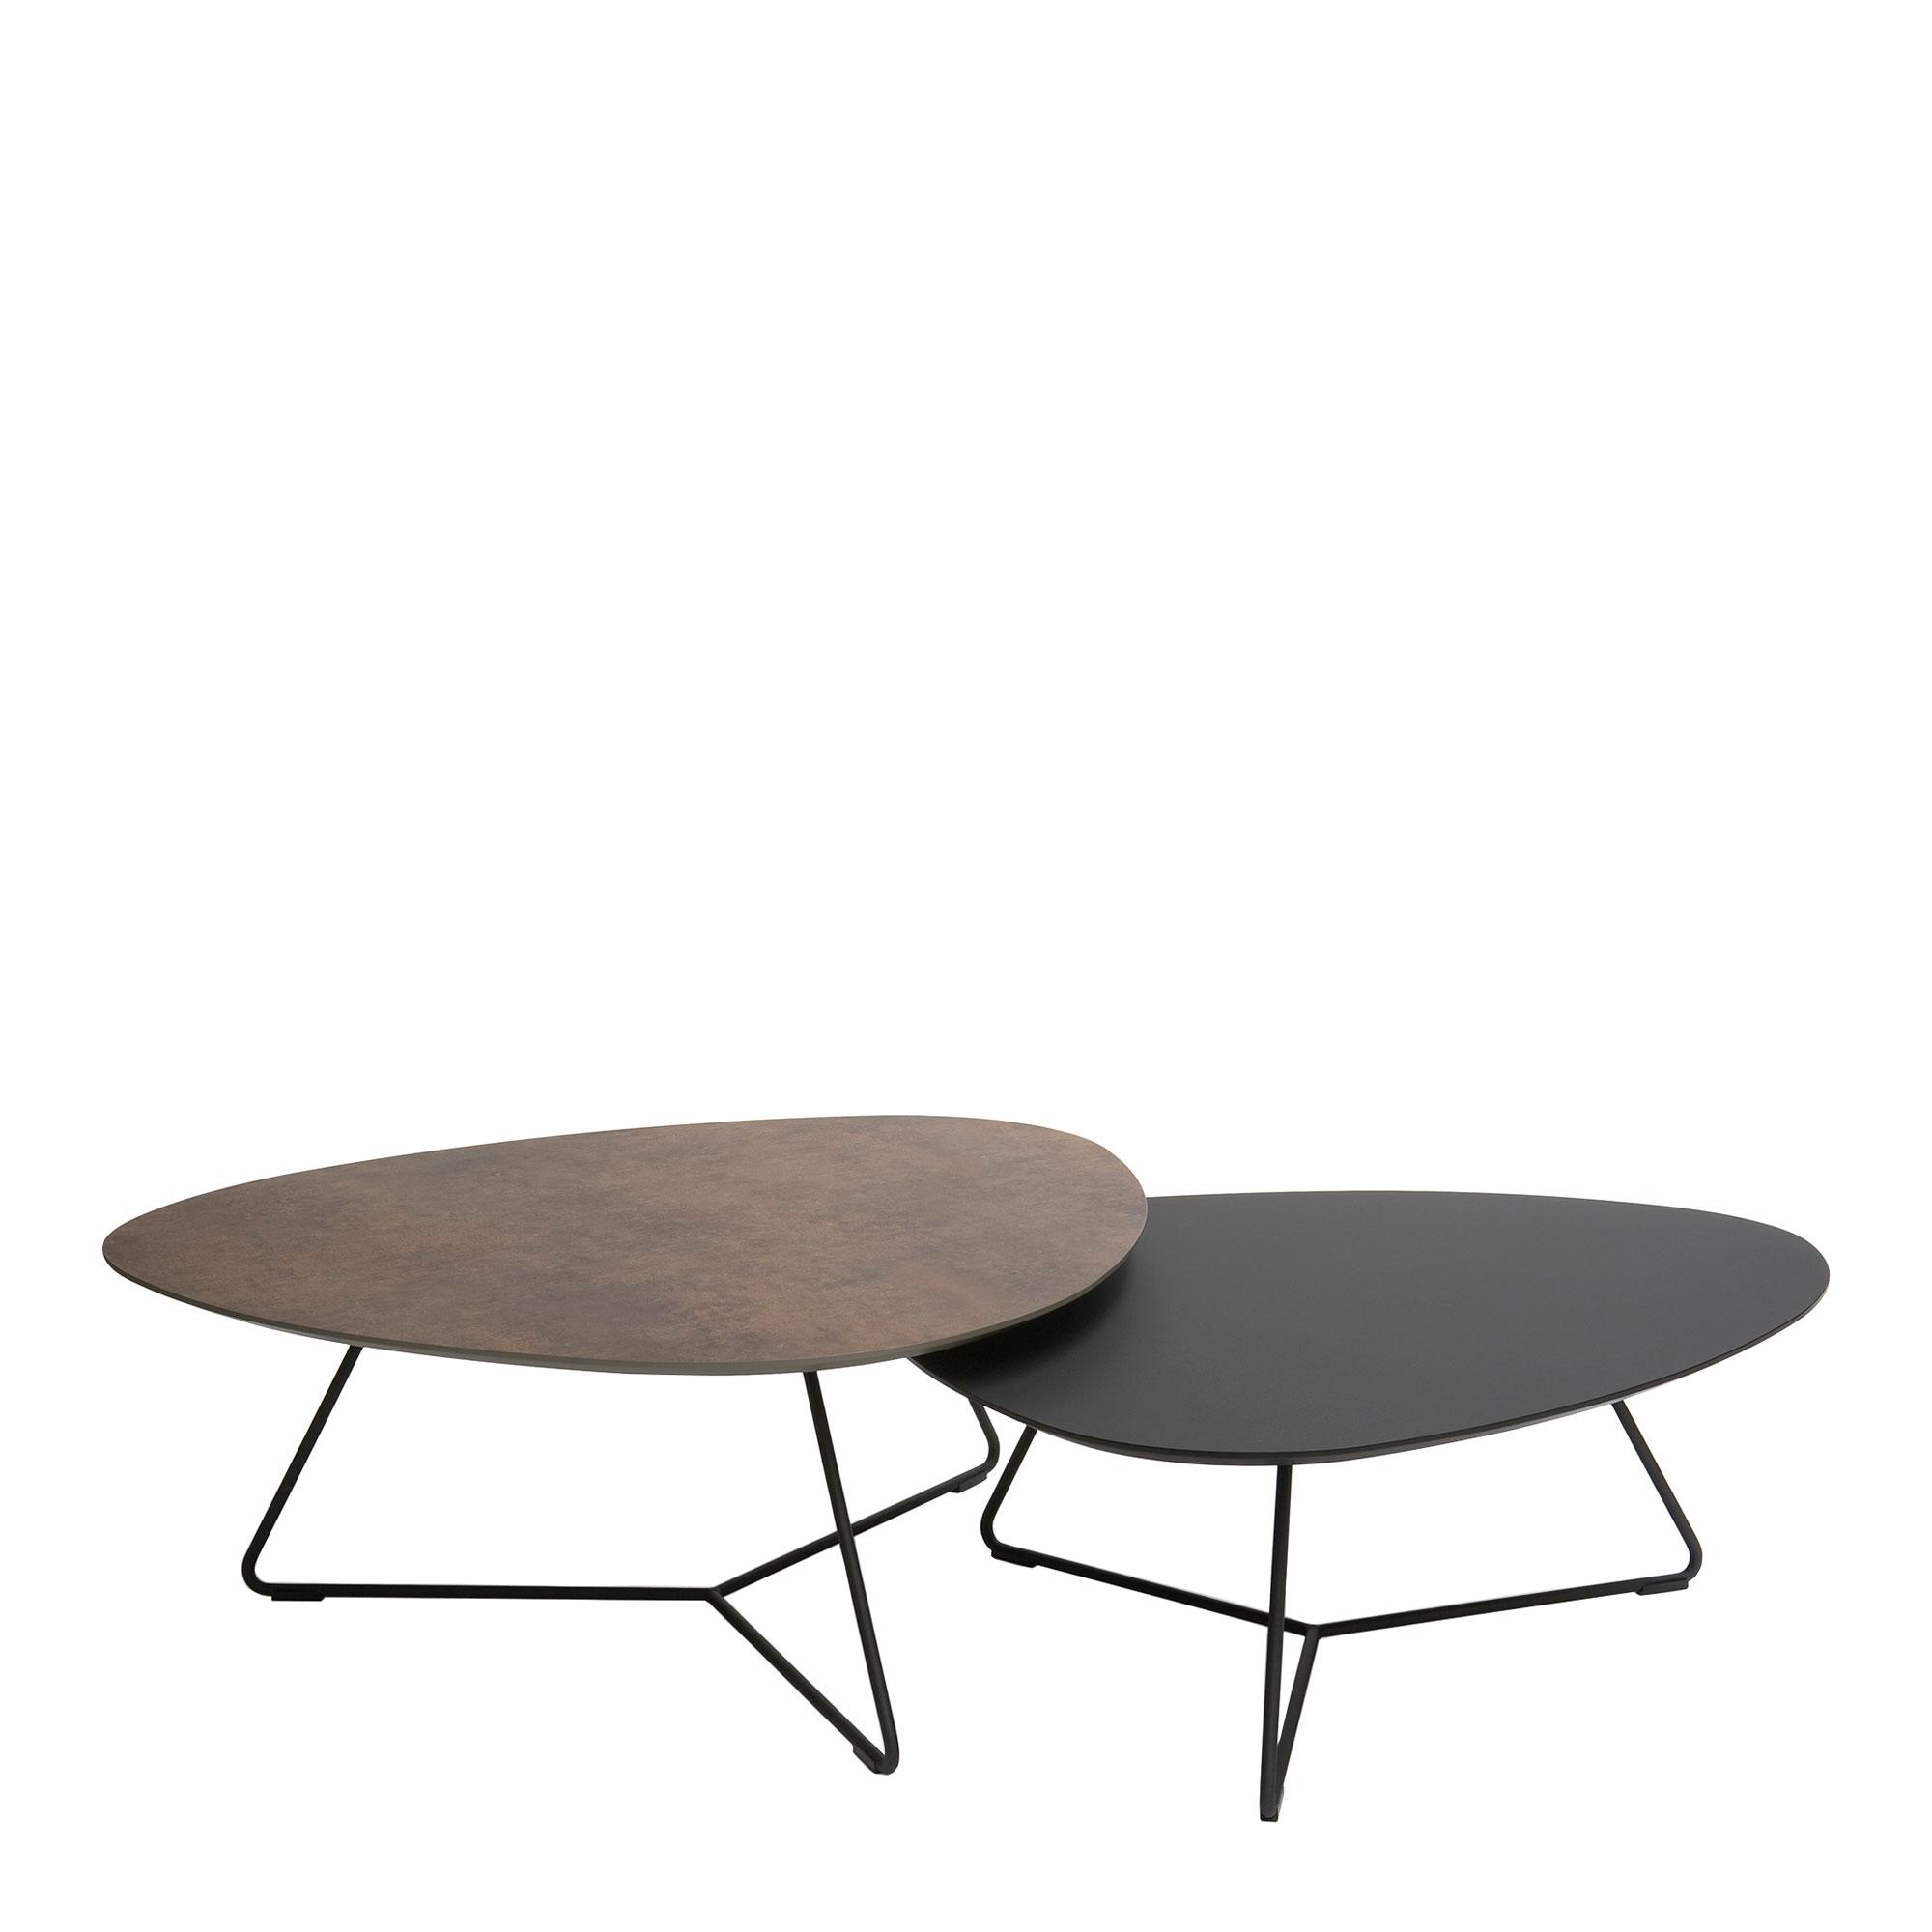 stratus coffee table set inc 95cm table 87cm table black frame